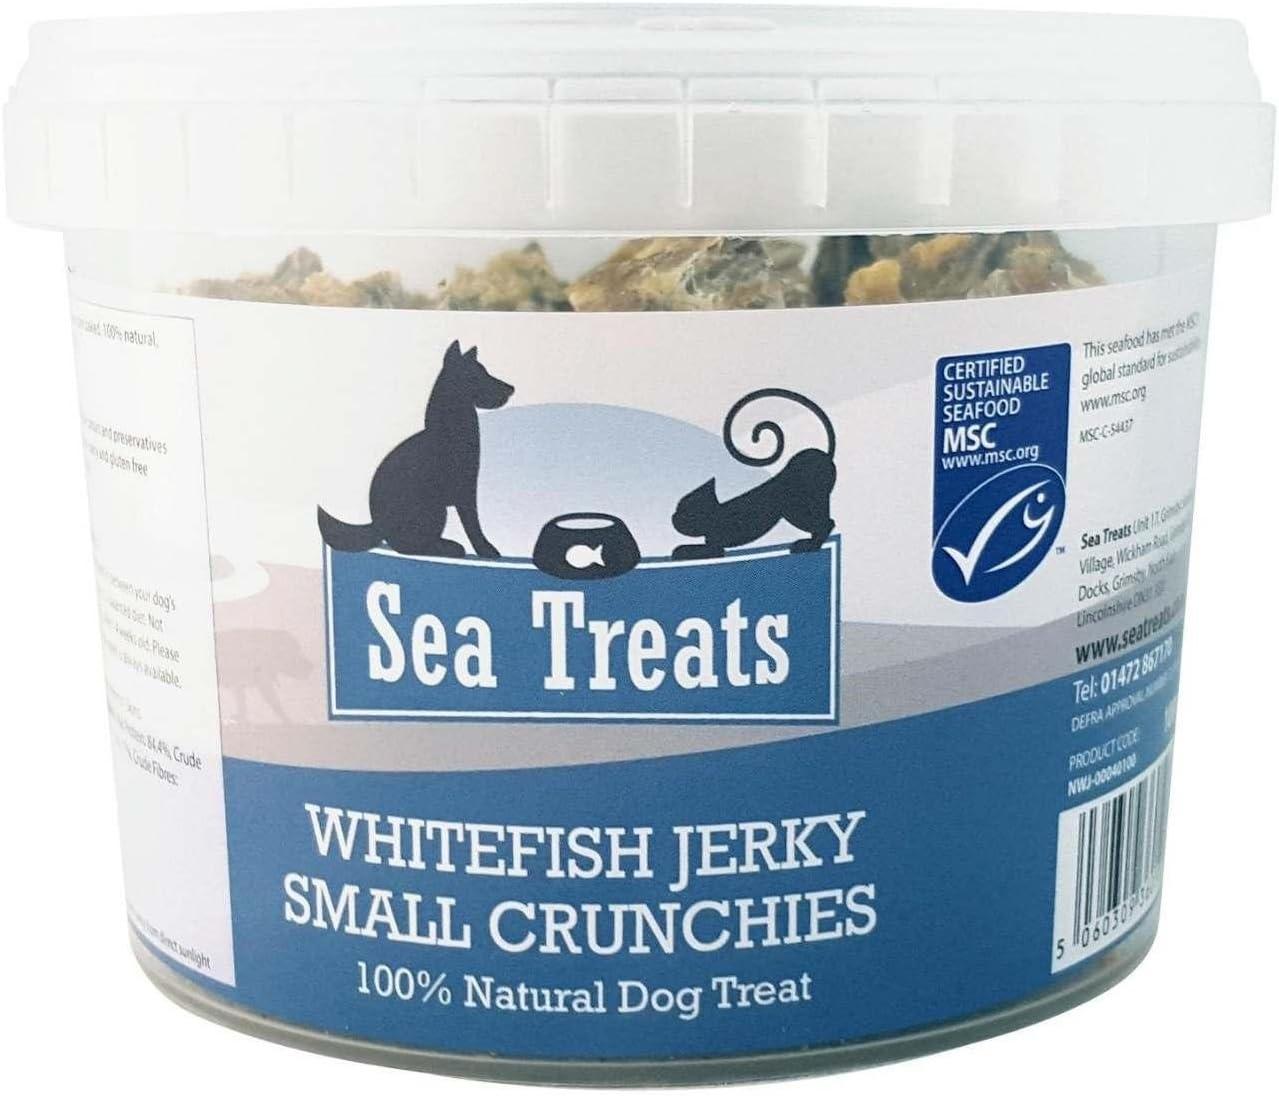 Sea Treats Whitefish Jerky Crunchies Small Dog Treats 1 Kg Amazon Co Uk Pet Supplies